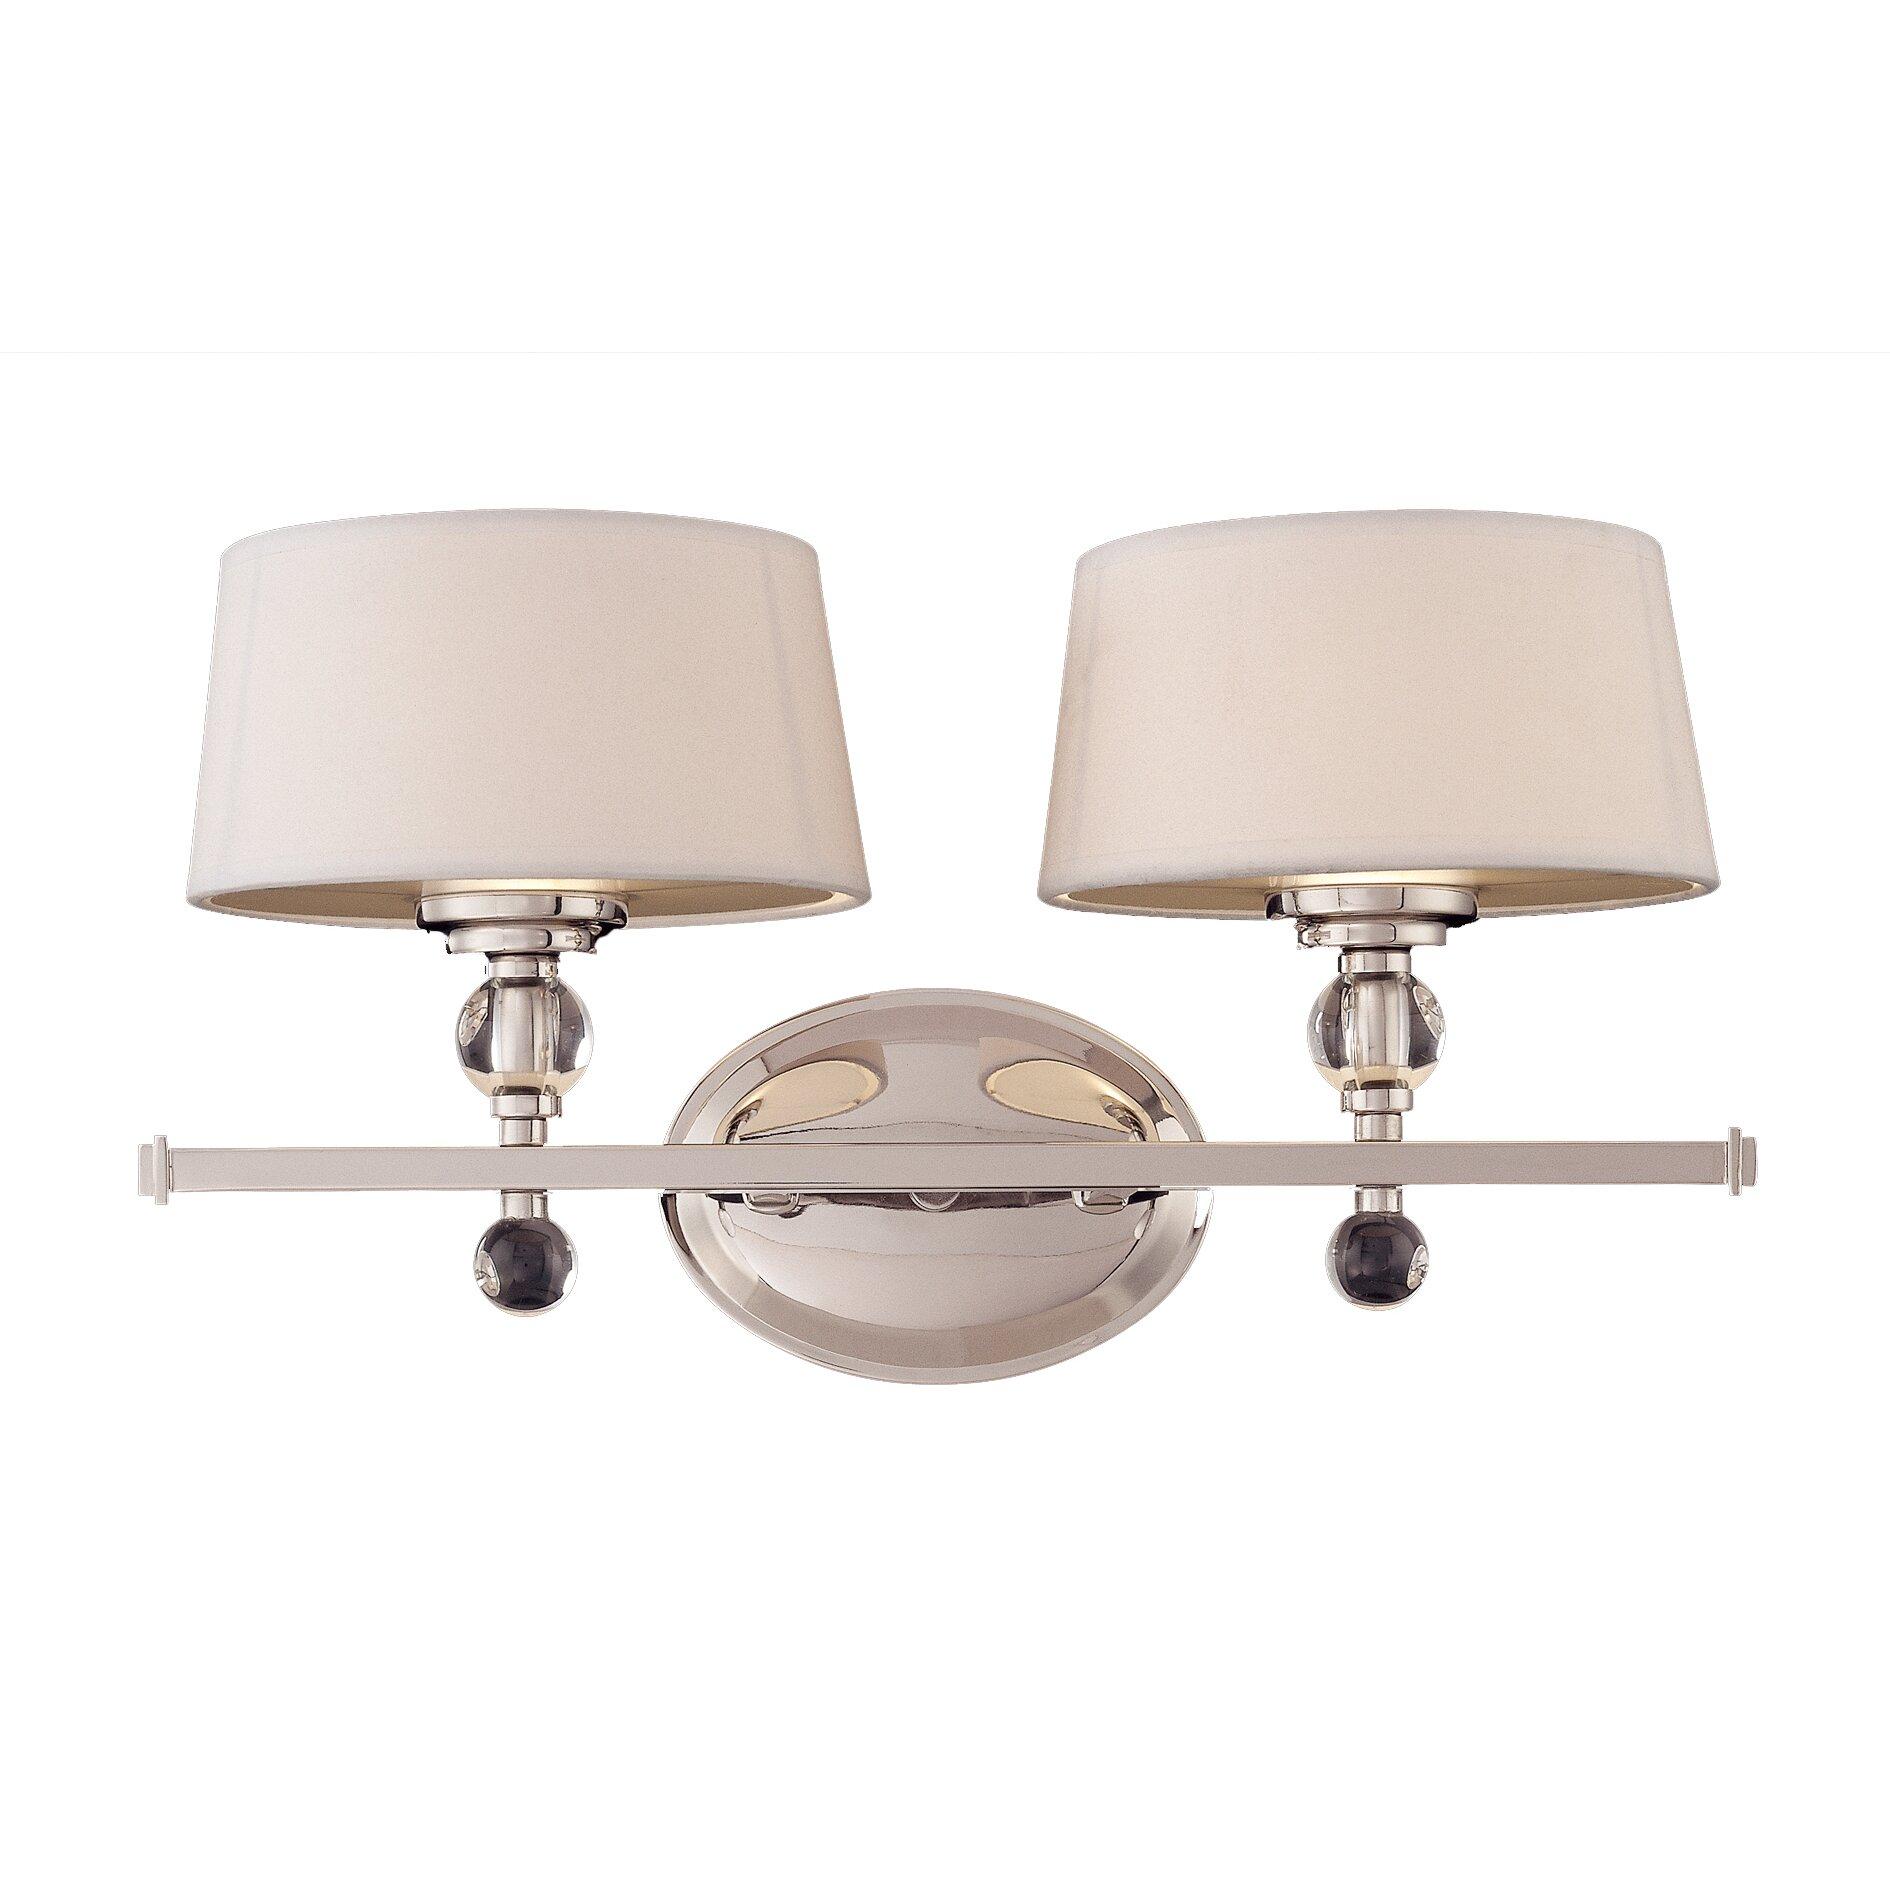 Savoy House Murren 2 Light Bath Vanity Light Reviews